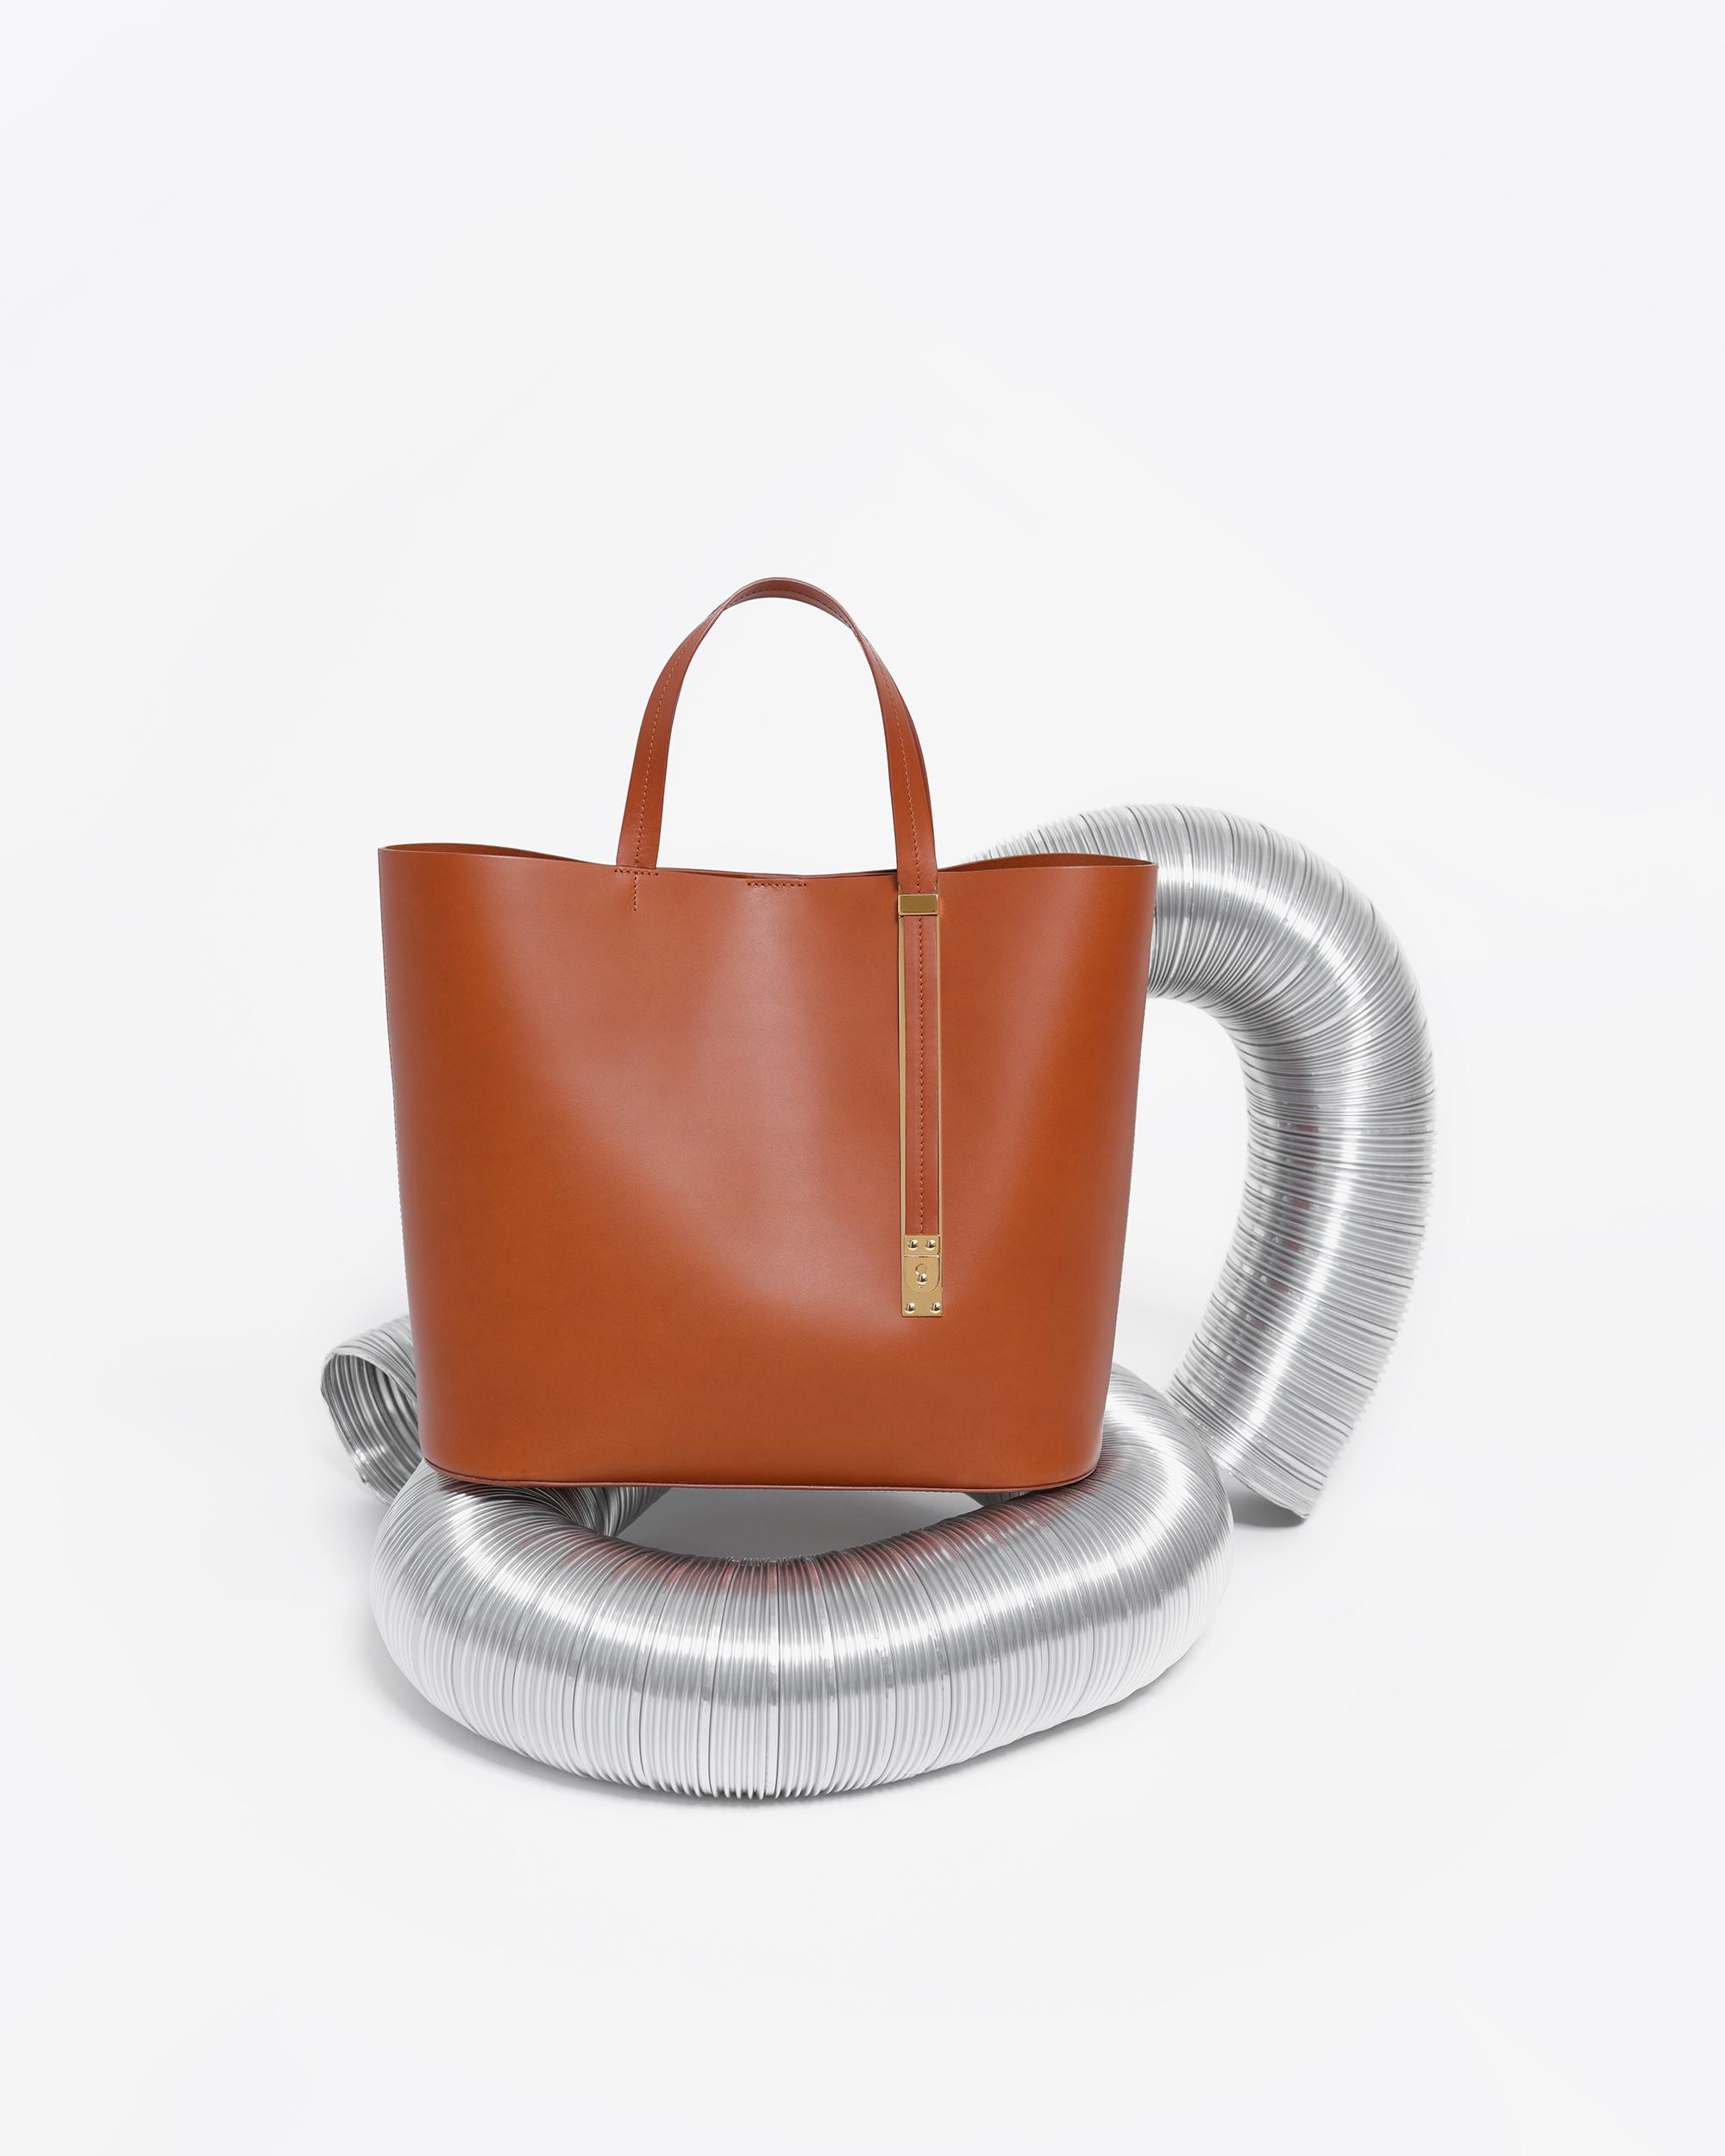 Handbag visual merchandising